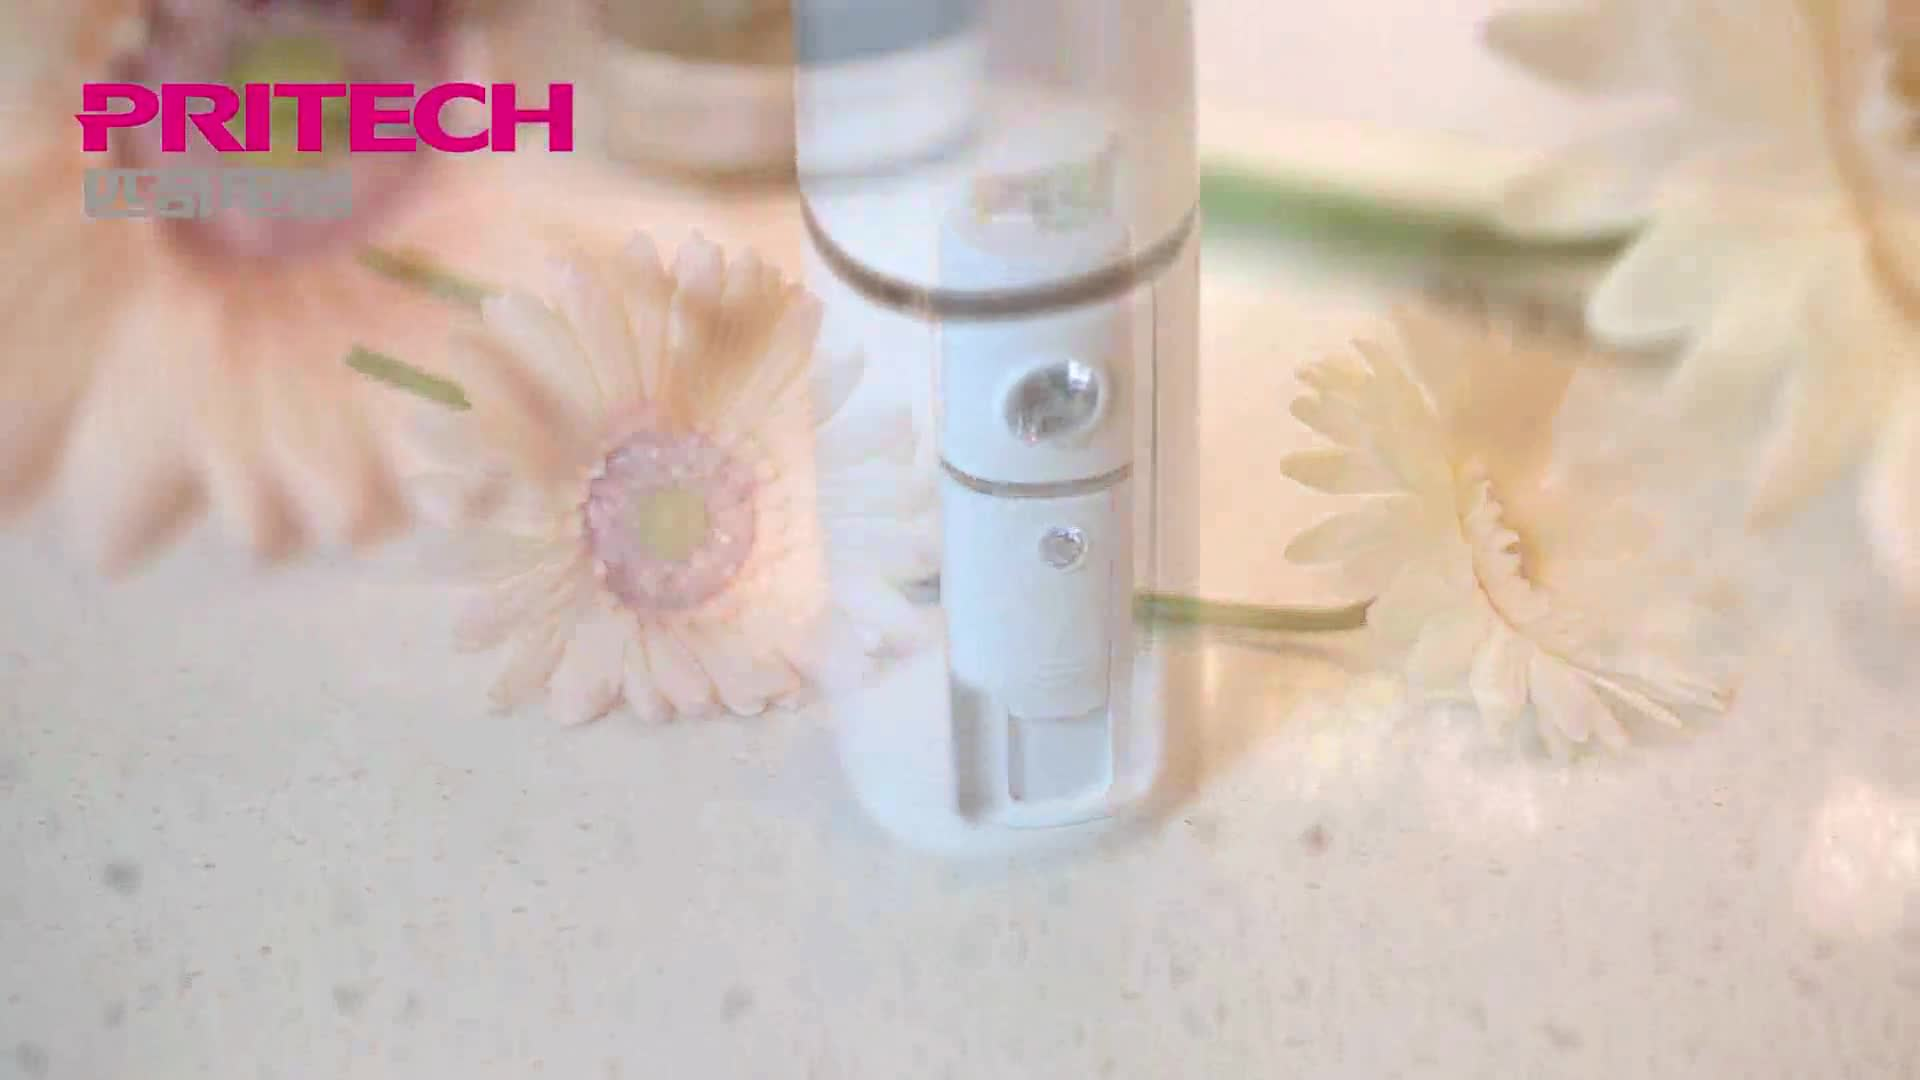 PRITECH Mini Handheld Face Steamer USB Rechargeable Facial Nano Mist Sprayer